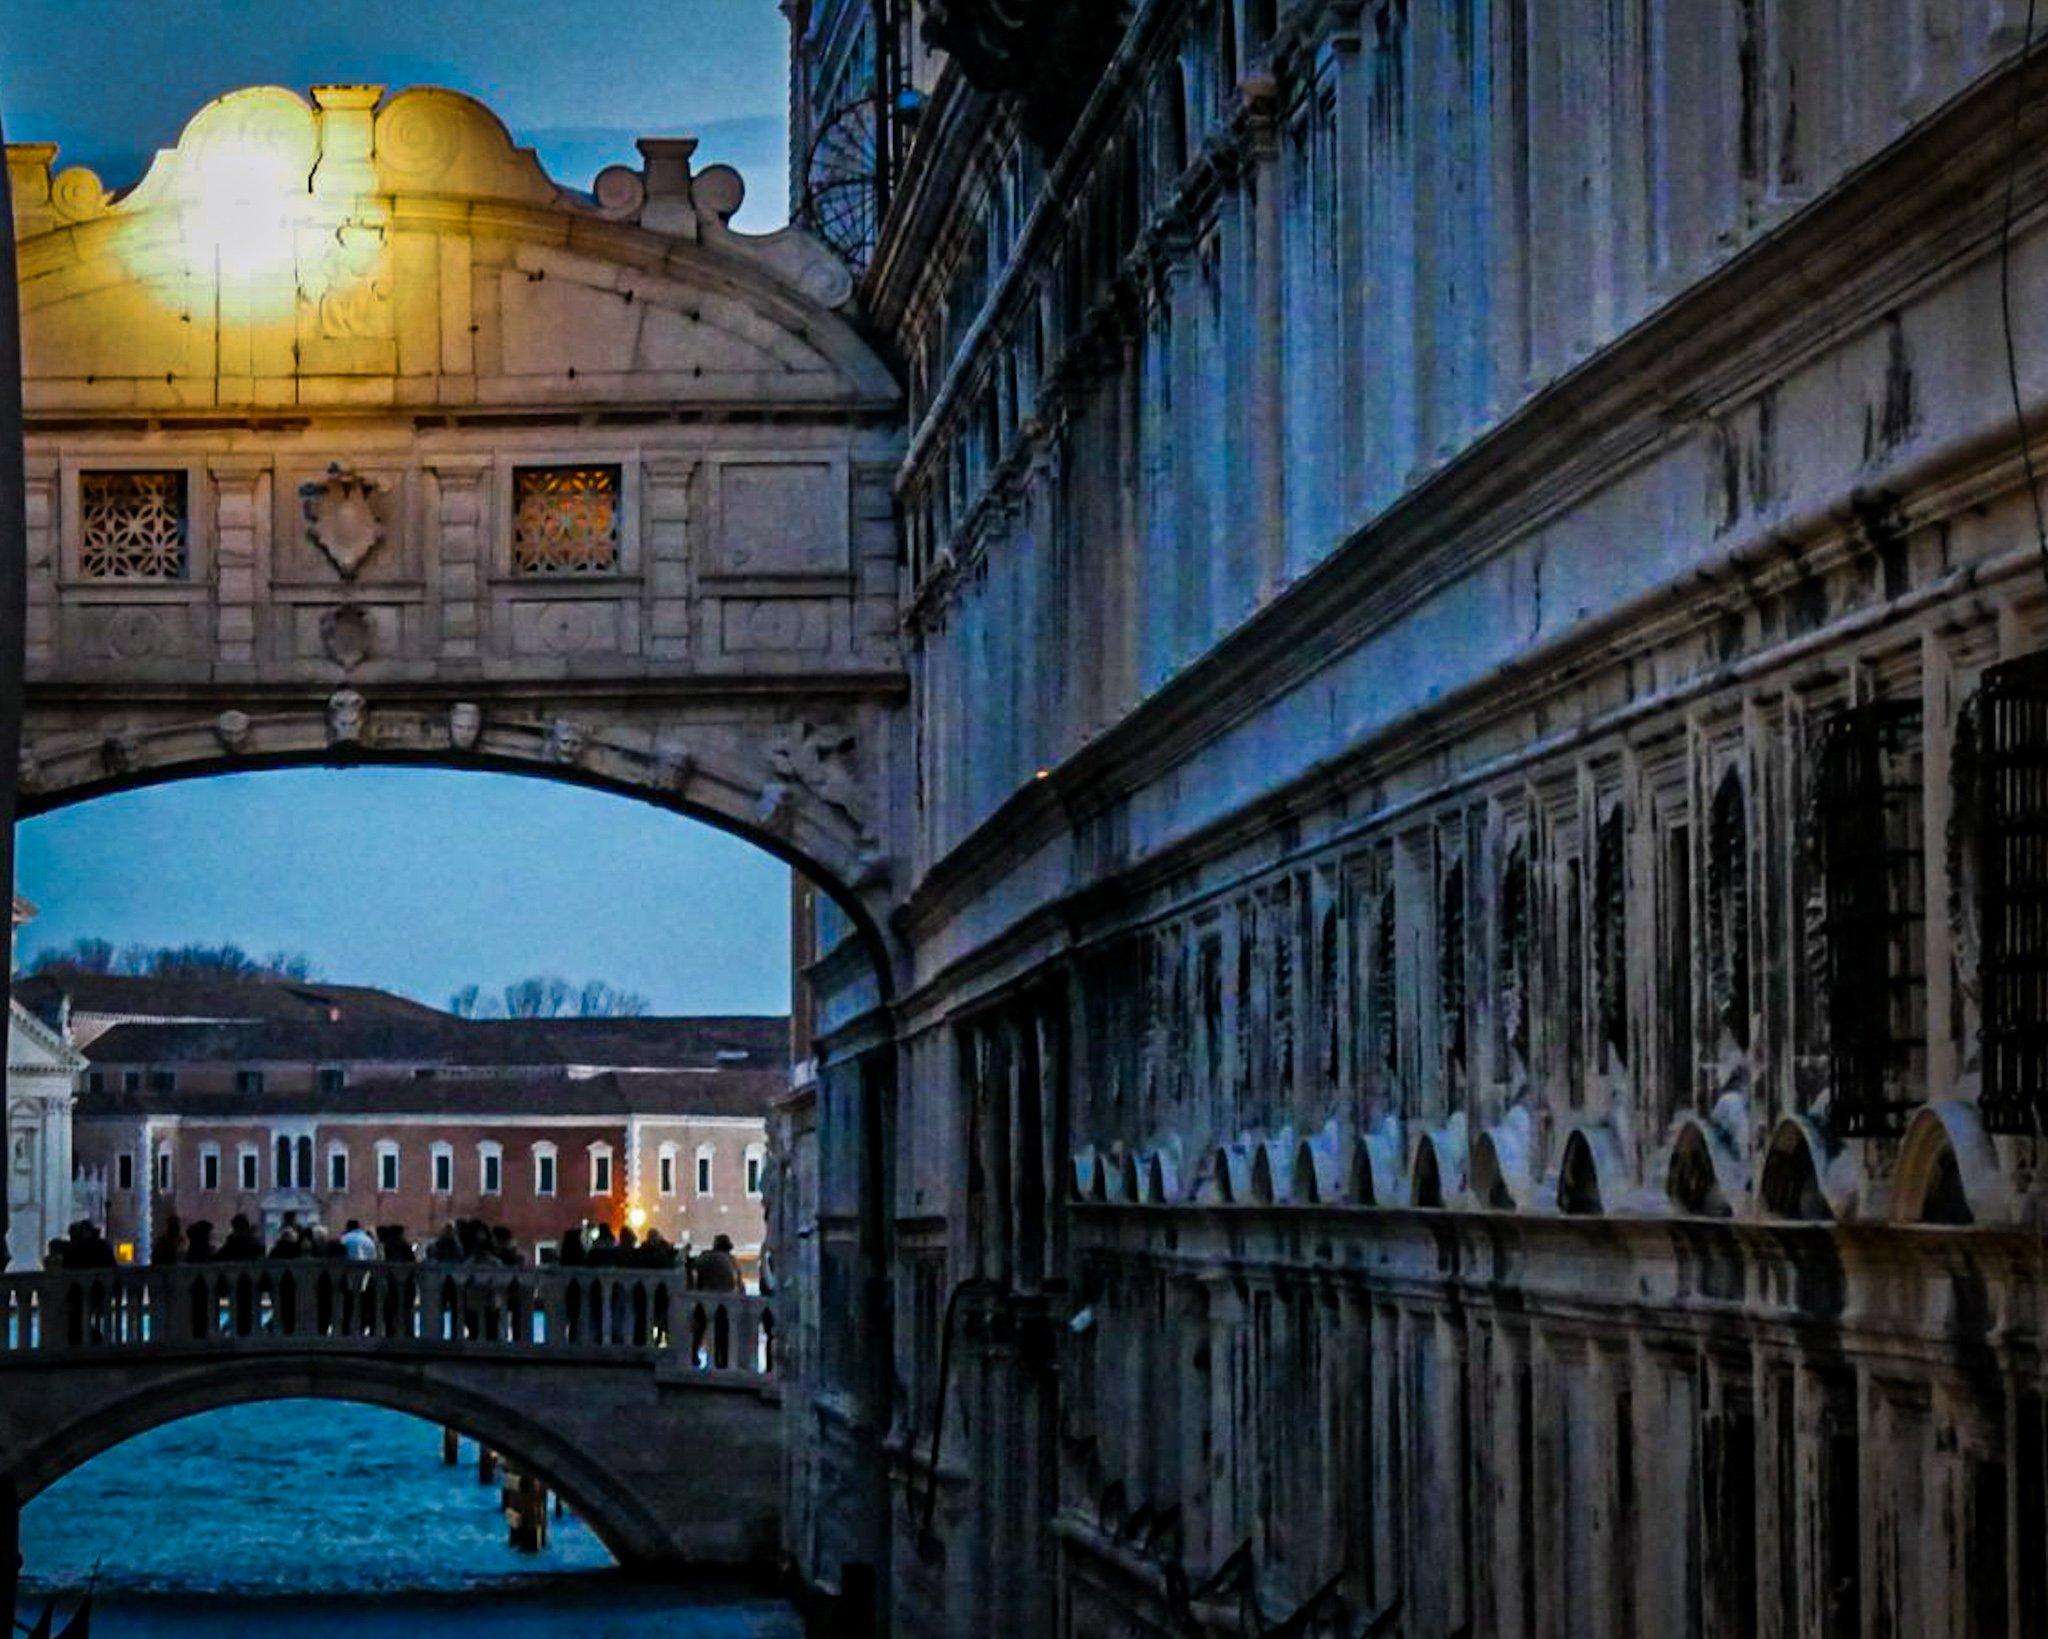 The Bridge of Sighs at nightfall